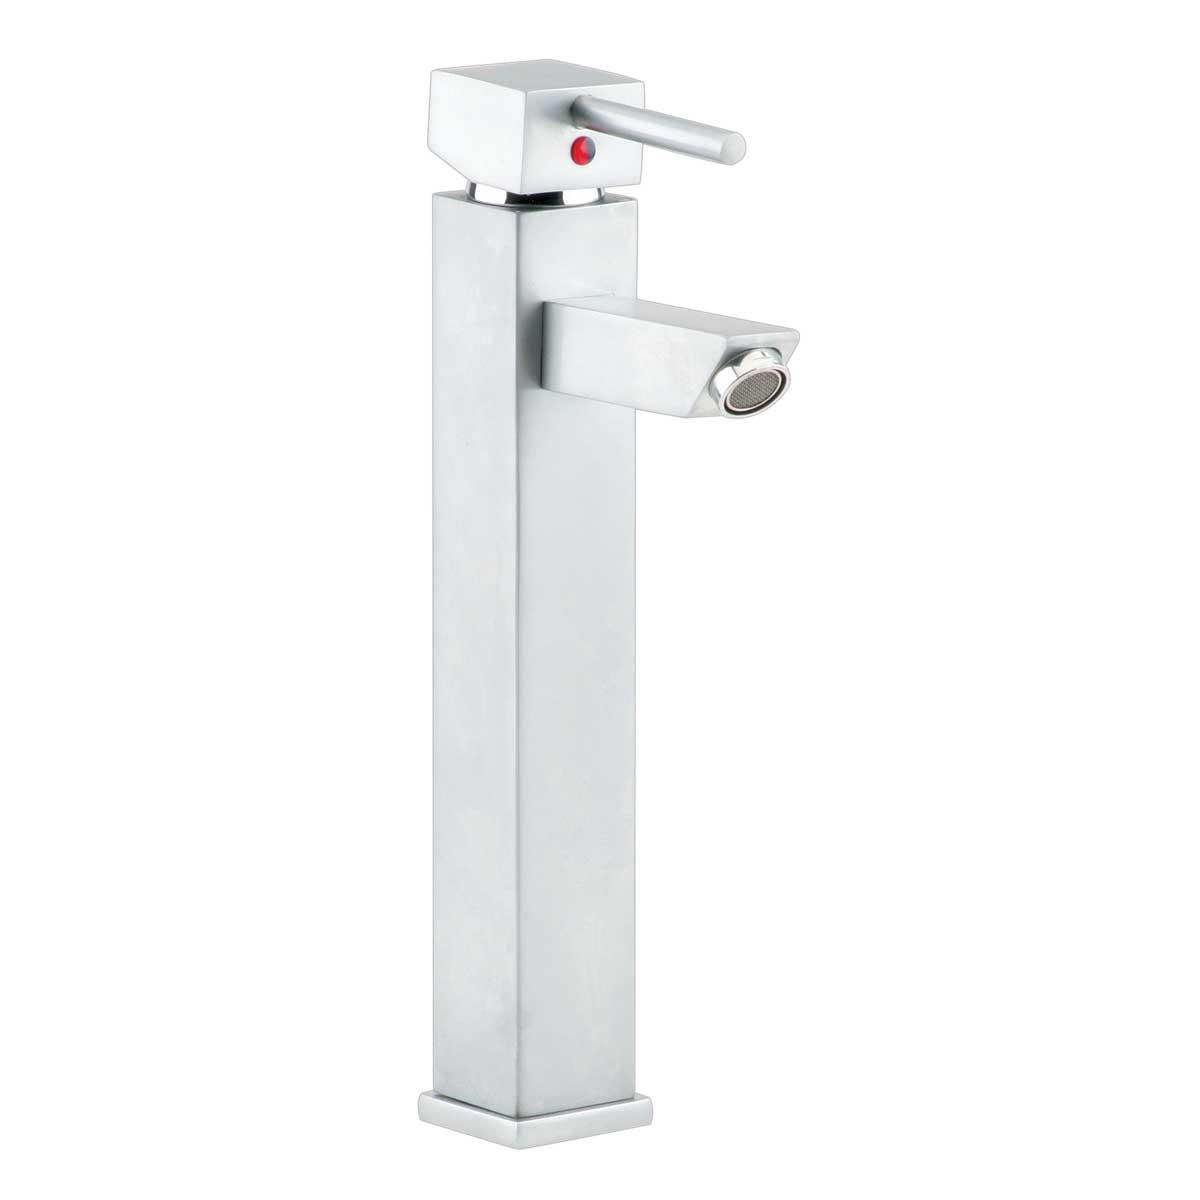 Bathroom Faucet Square Satin Nickel Single Hole 1 Handle